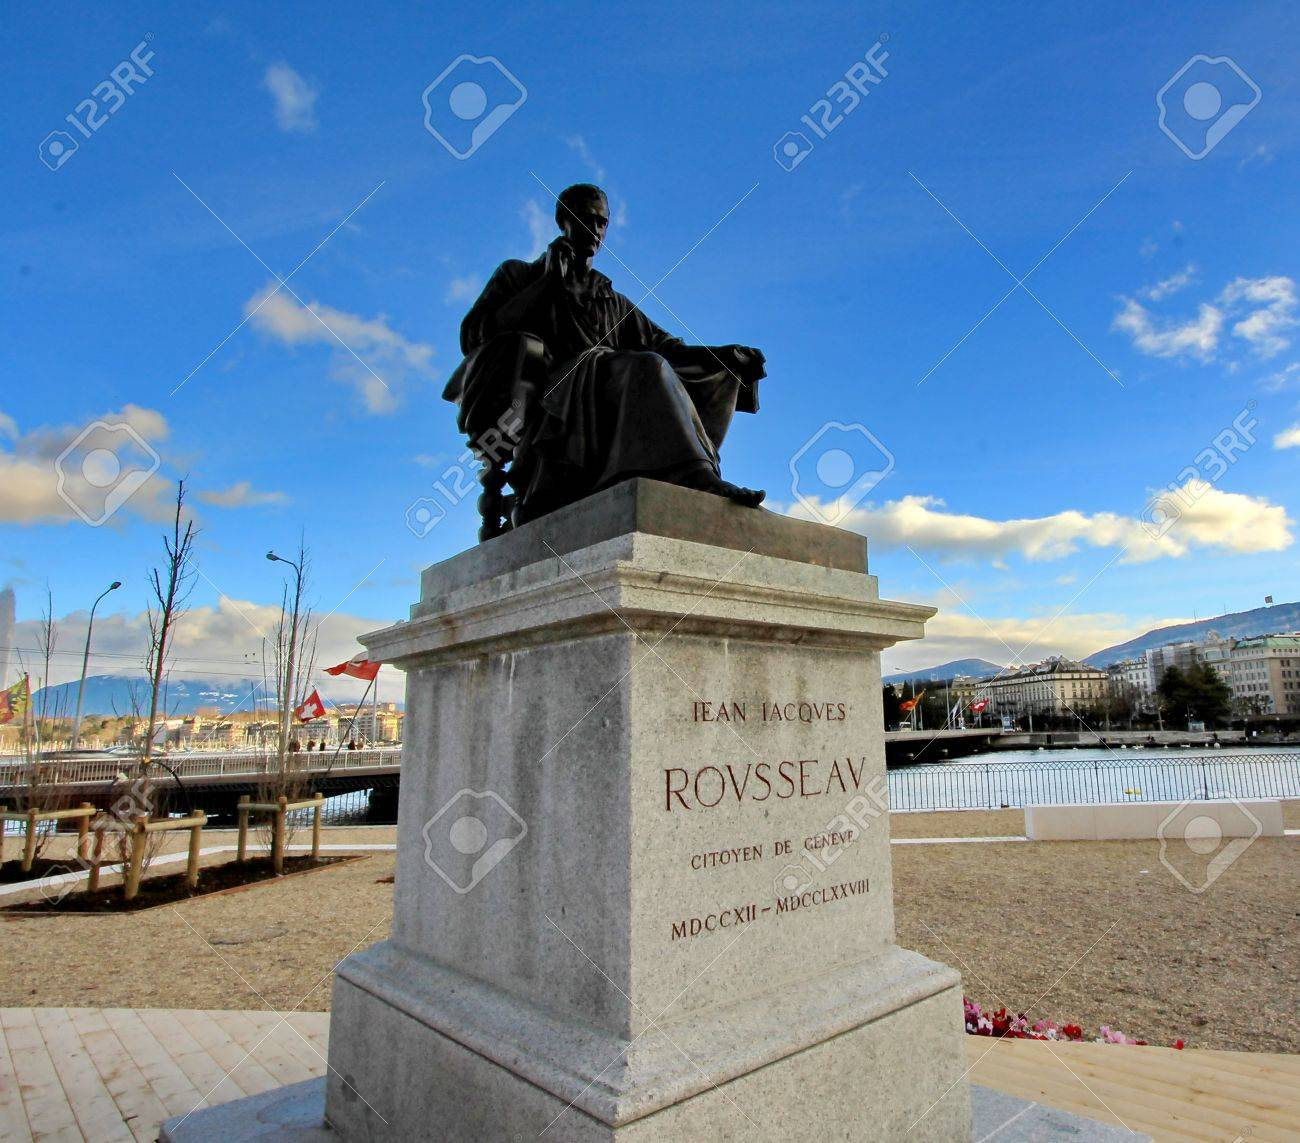 Jean Jacques Rousseau, Geneva, Switzerland - 12092147